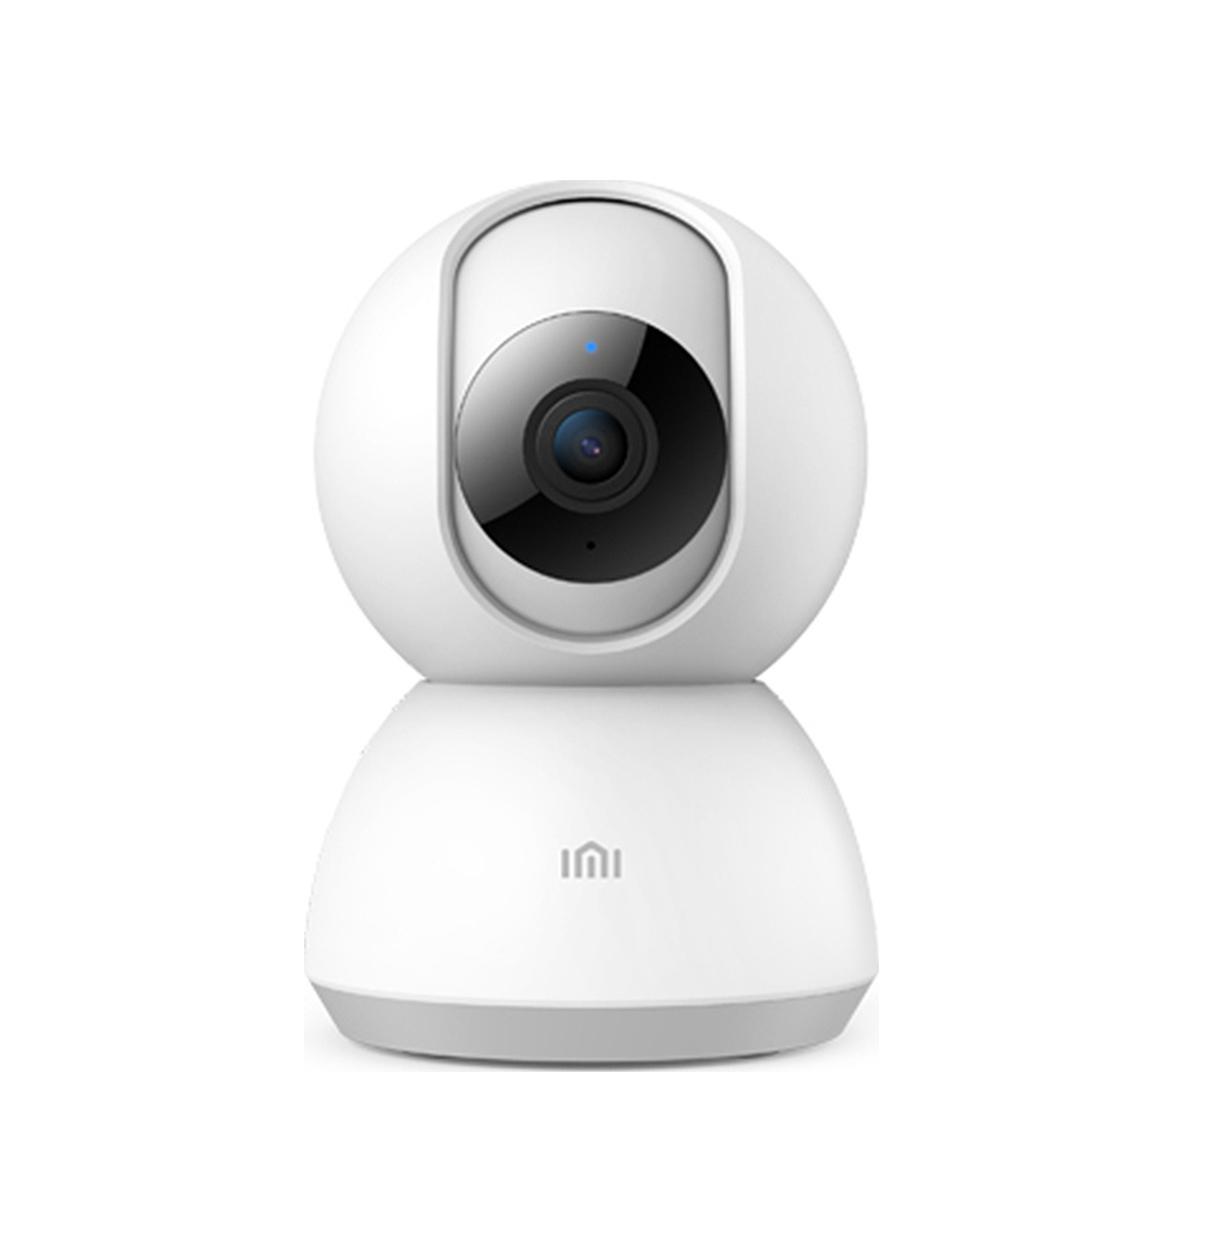 Xiaomi IMI Home Security Camera 360° 1080p White CMSXJ16A